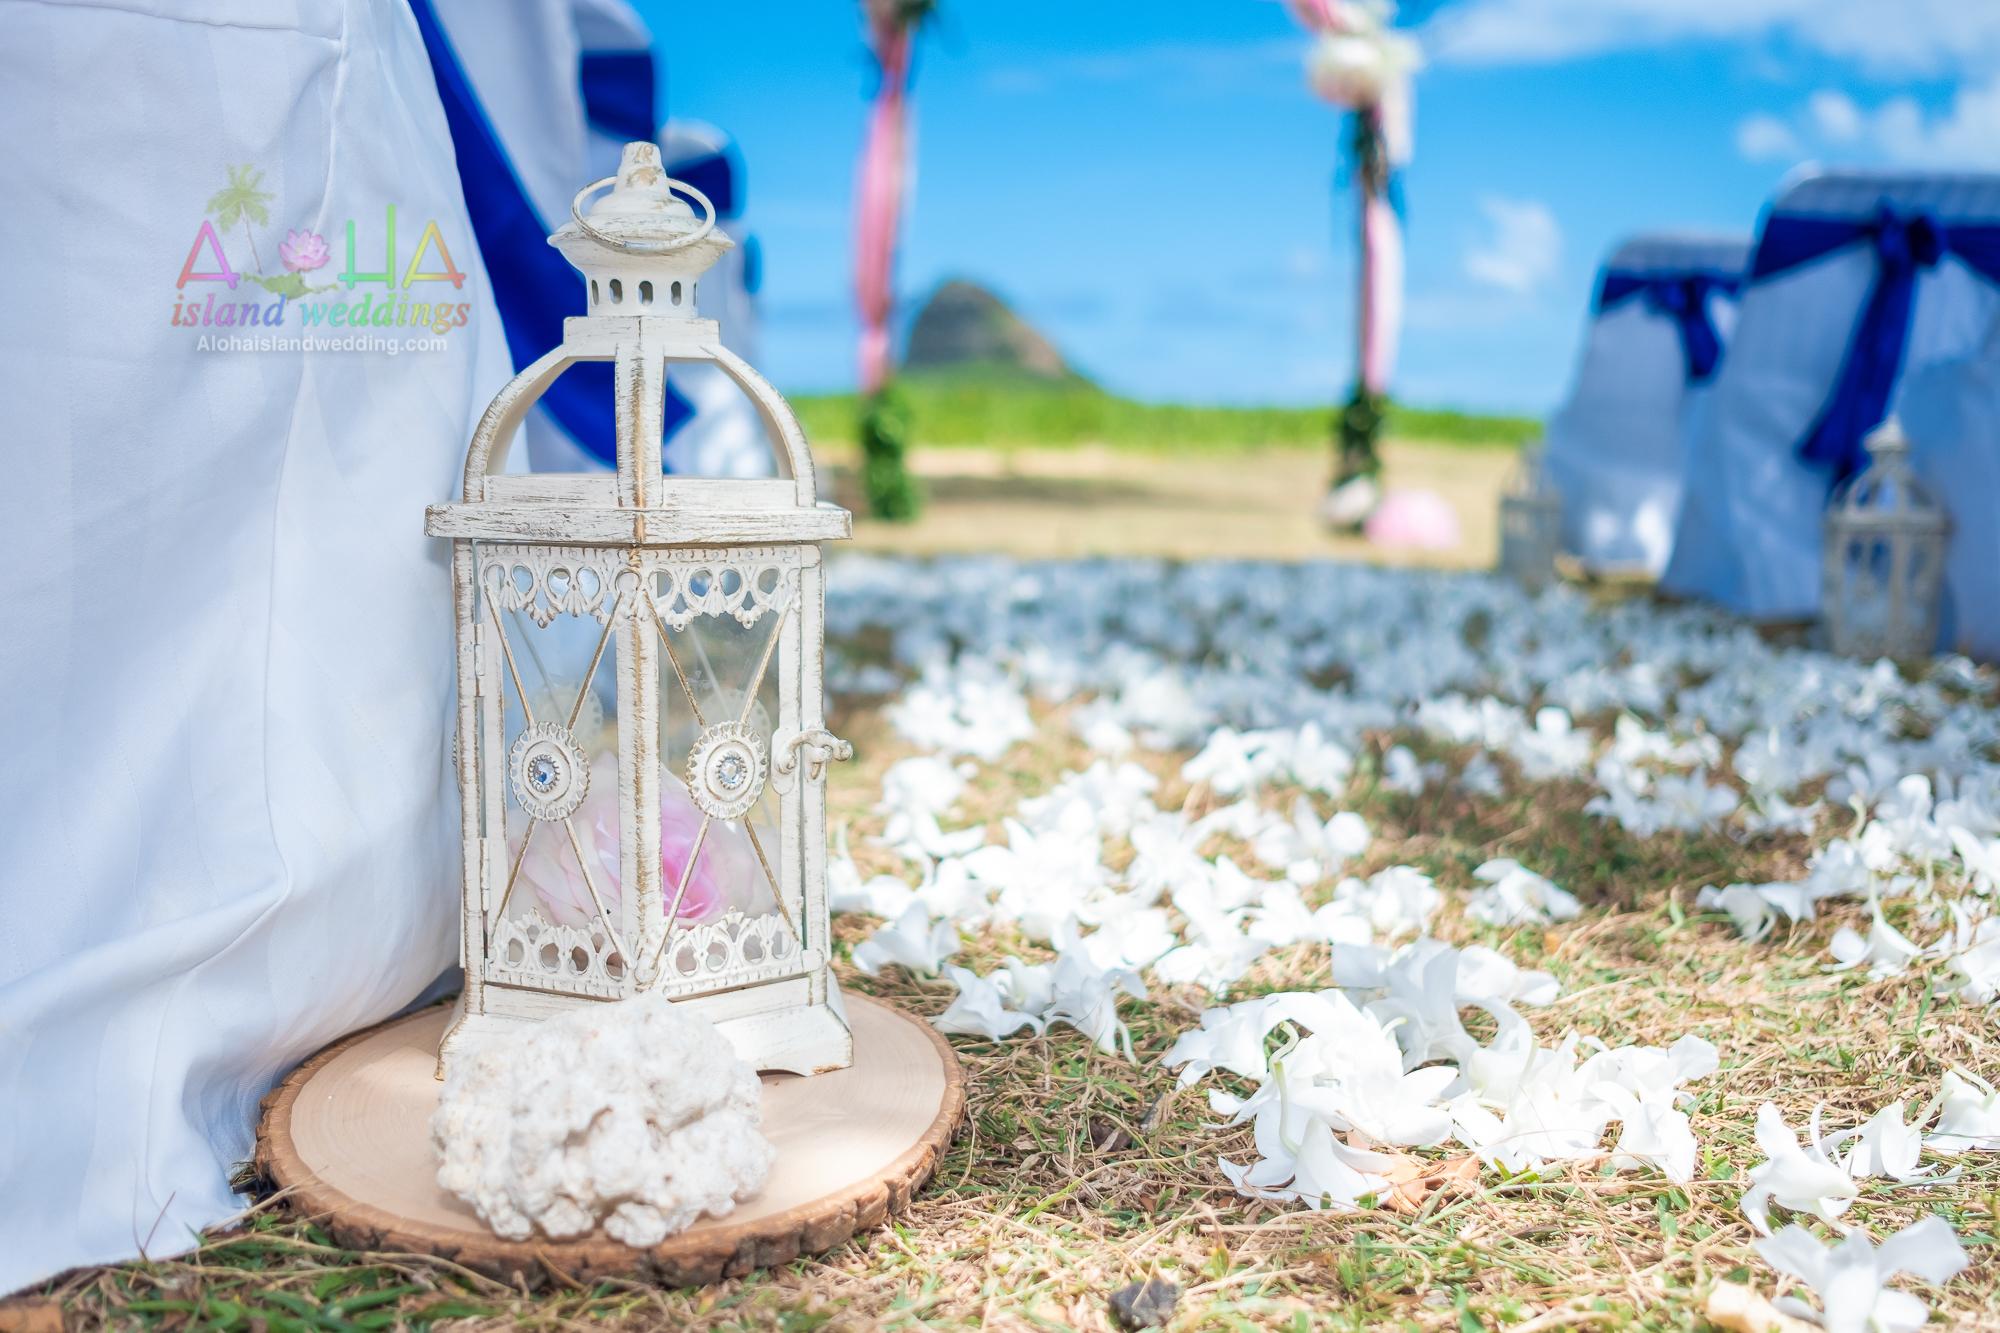 Hawaii weddings and events, Kualoa-1